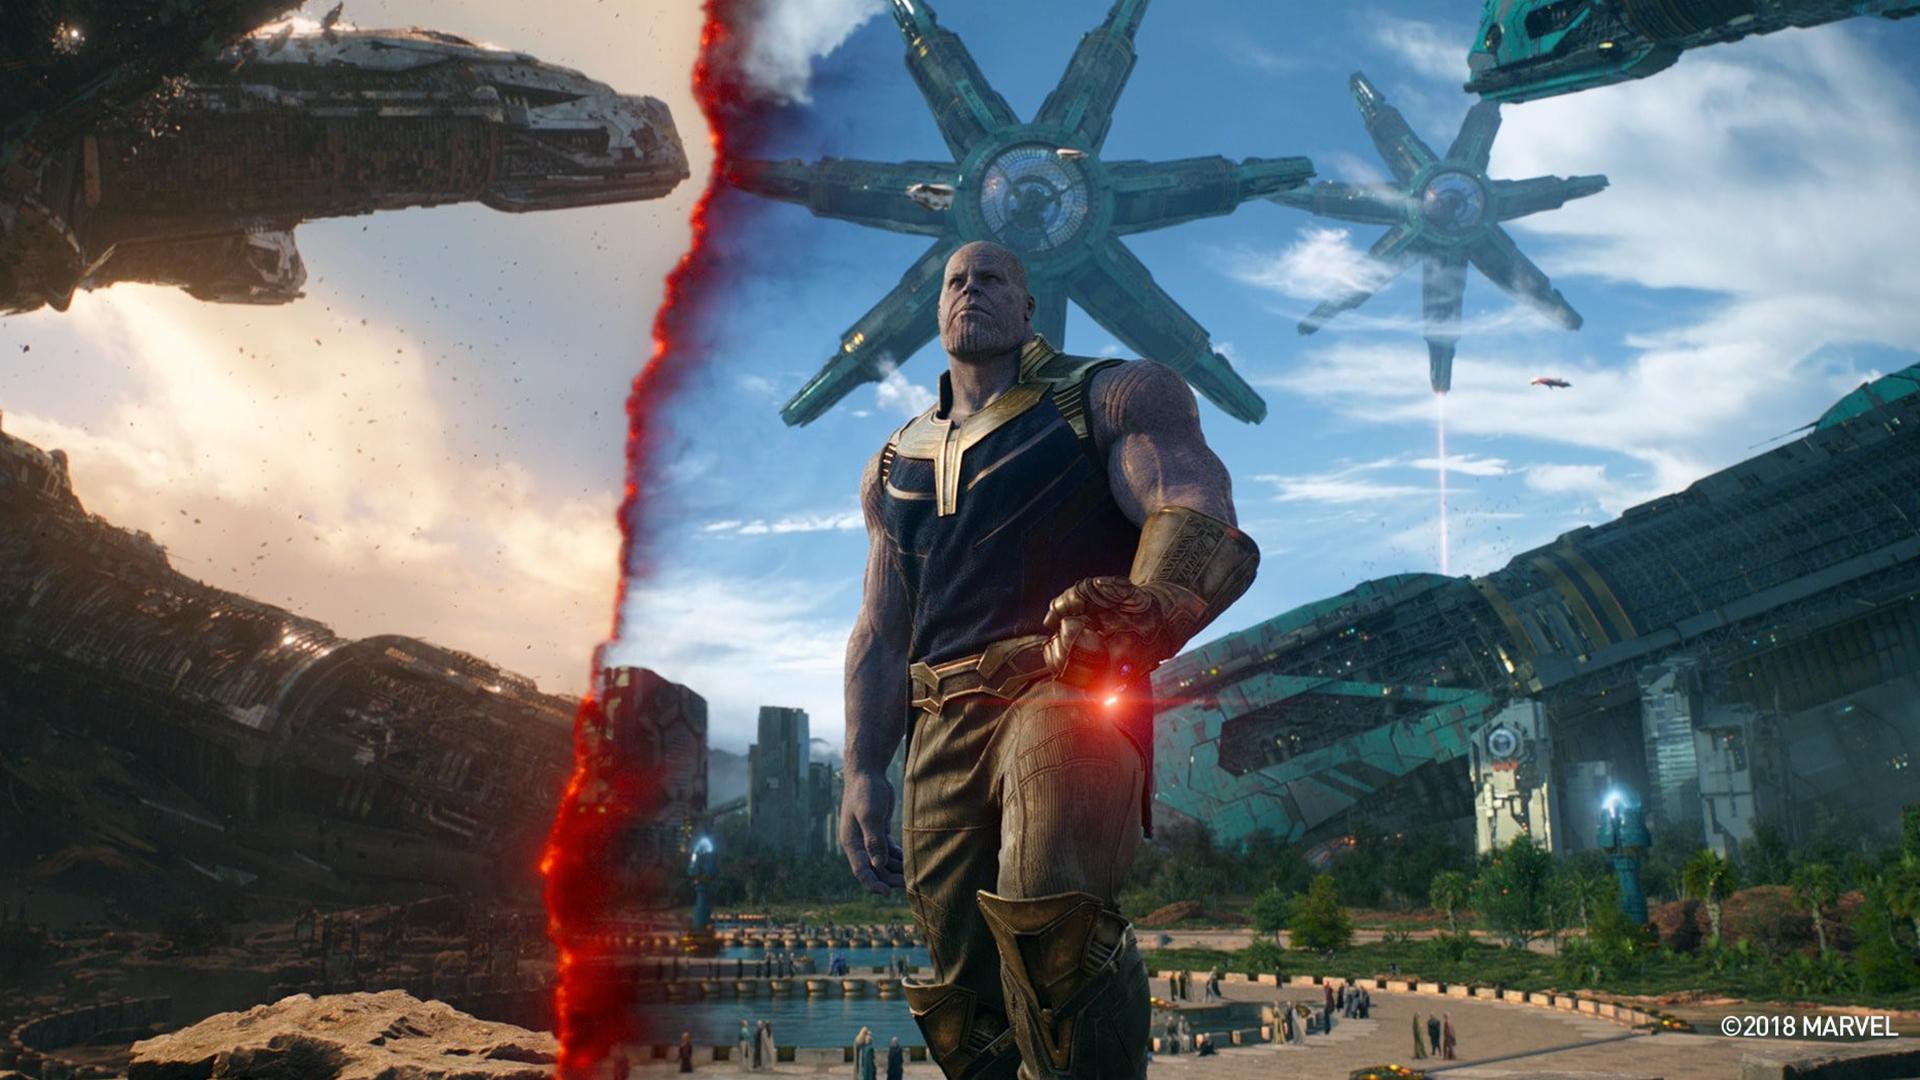 Thanos In Titan Avengers Infinity War, Full HD Wallpaper